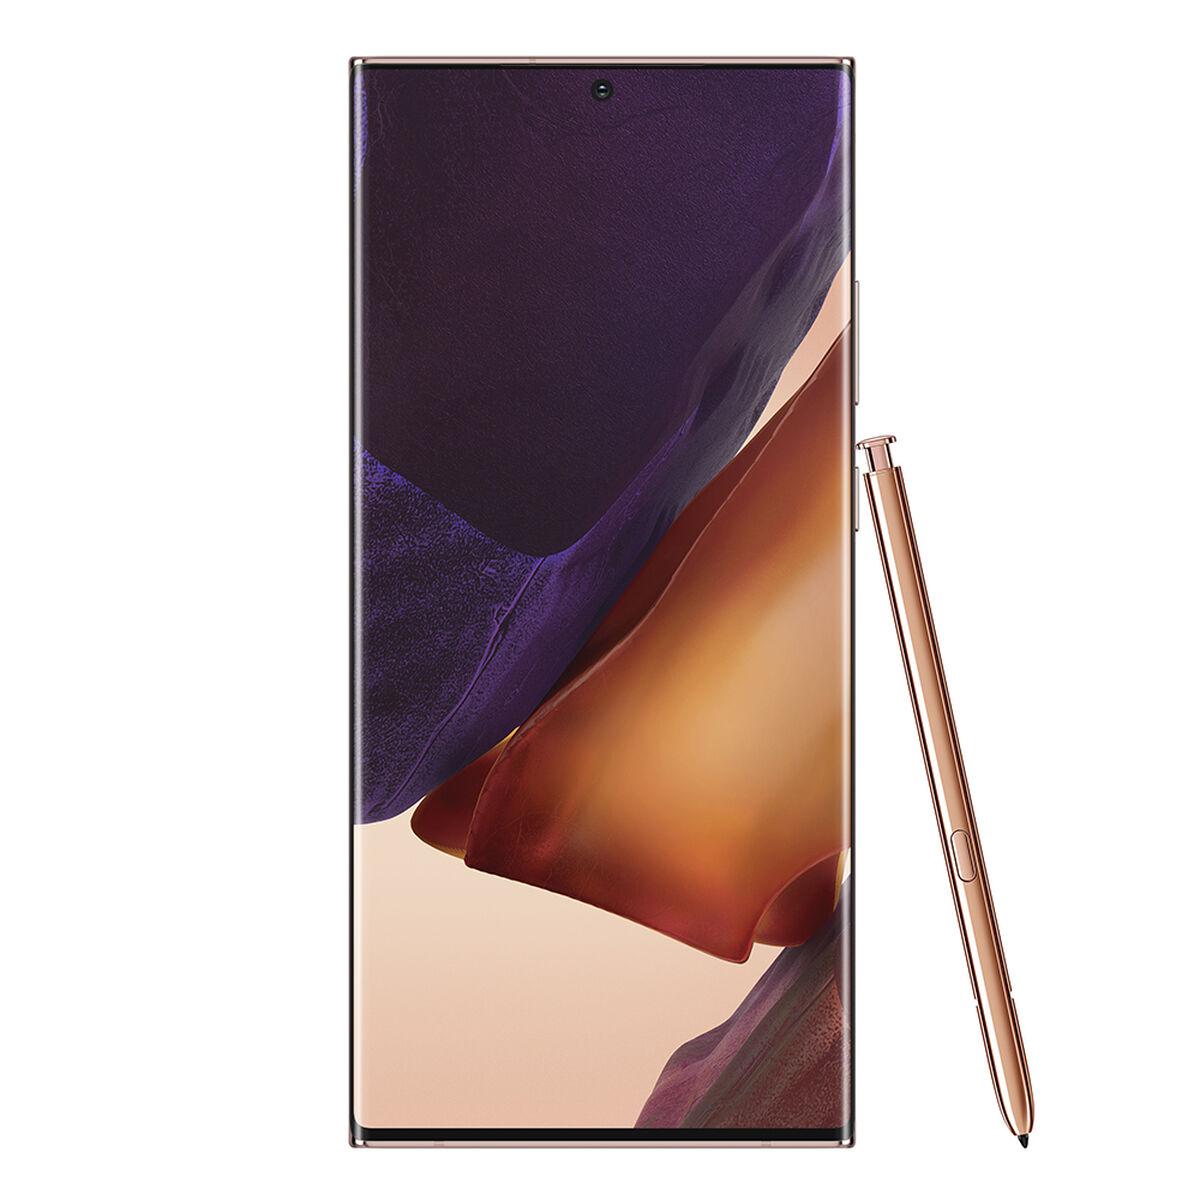 "Celular Samsung Galaxy Note20 Ultra 256GB 6.9"" Mystic Bronze Liberado"